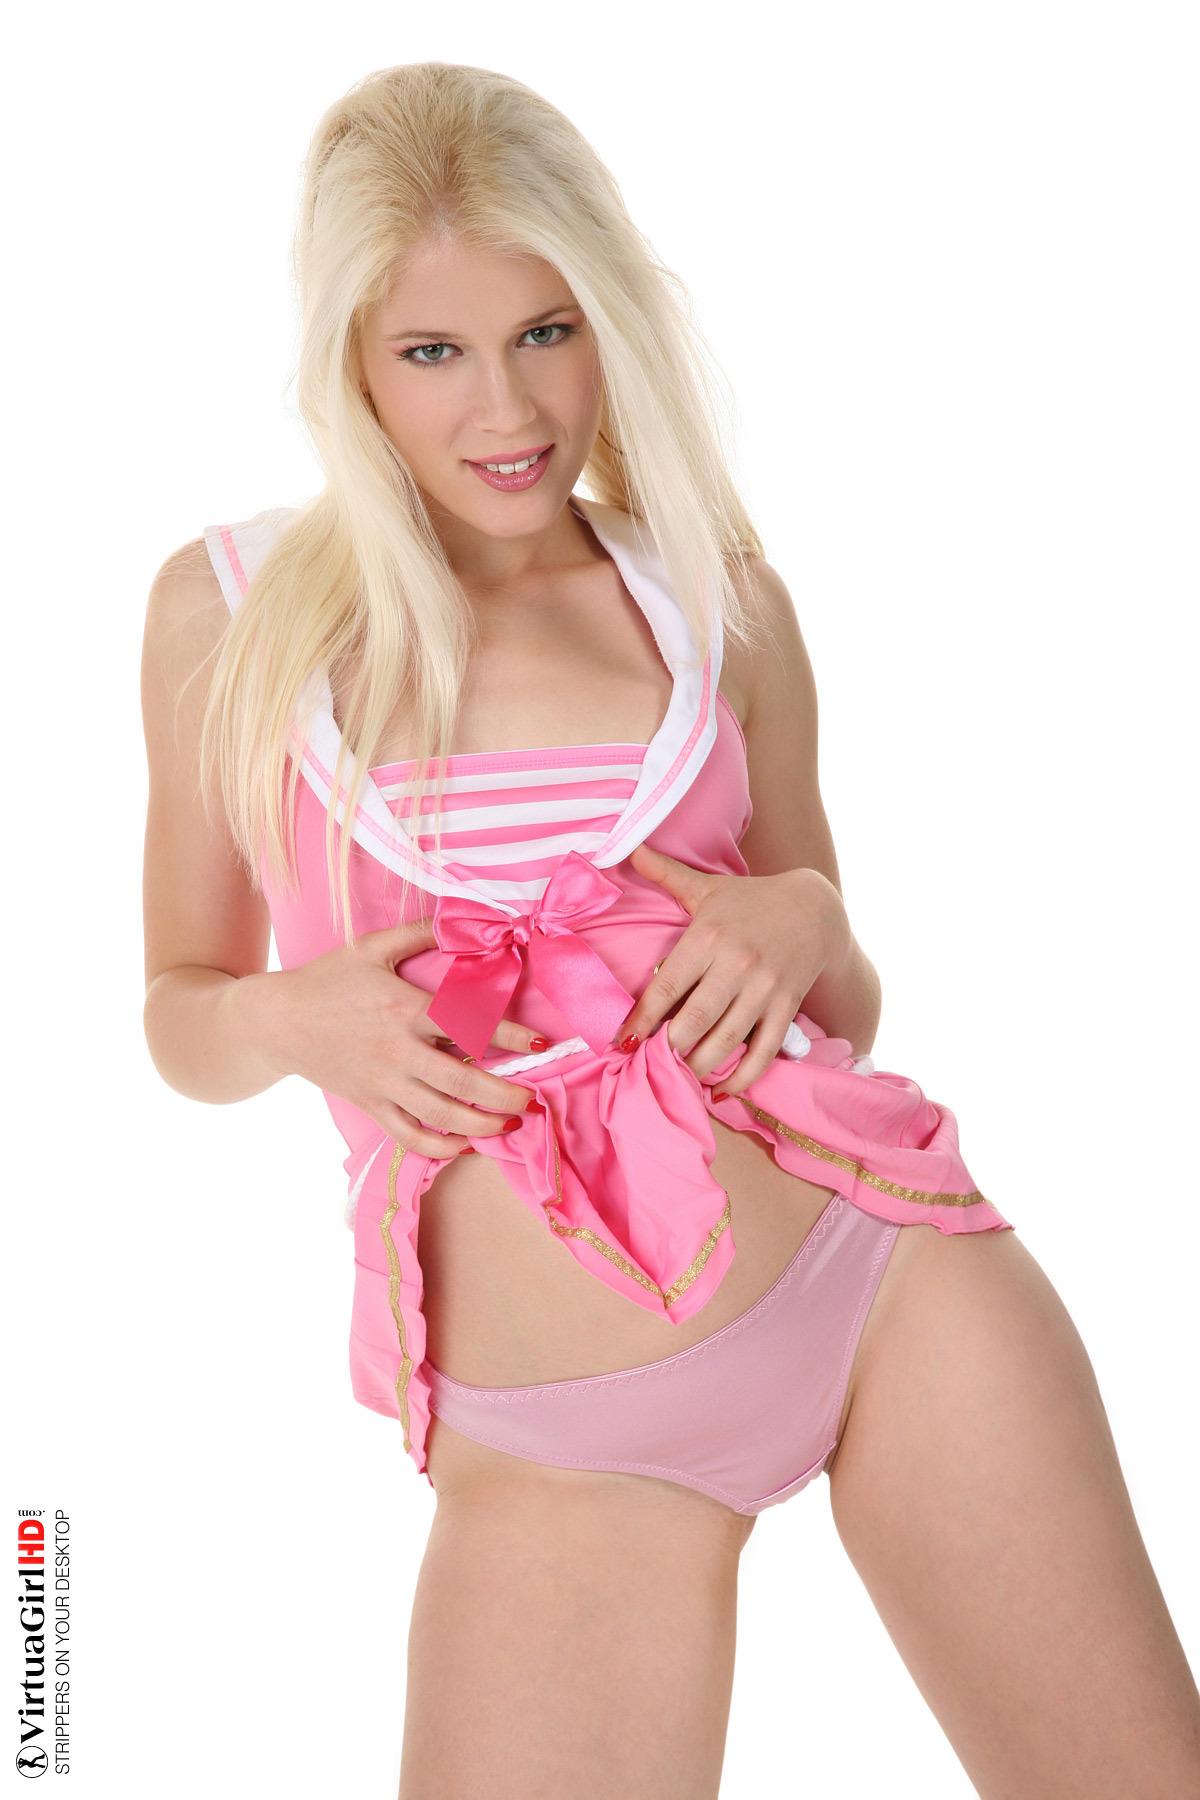 vinesauce joel the desktop stripper